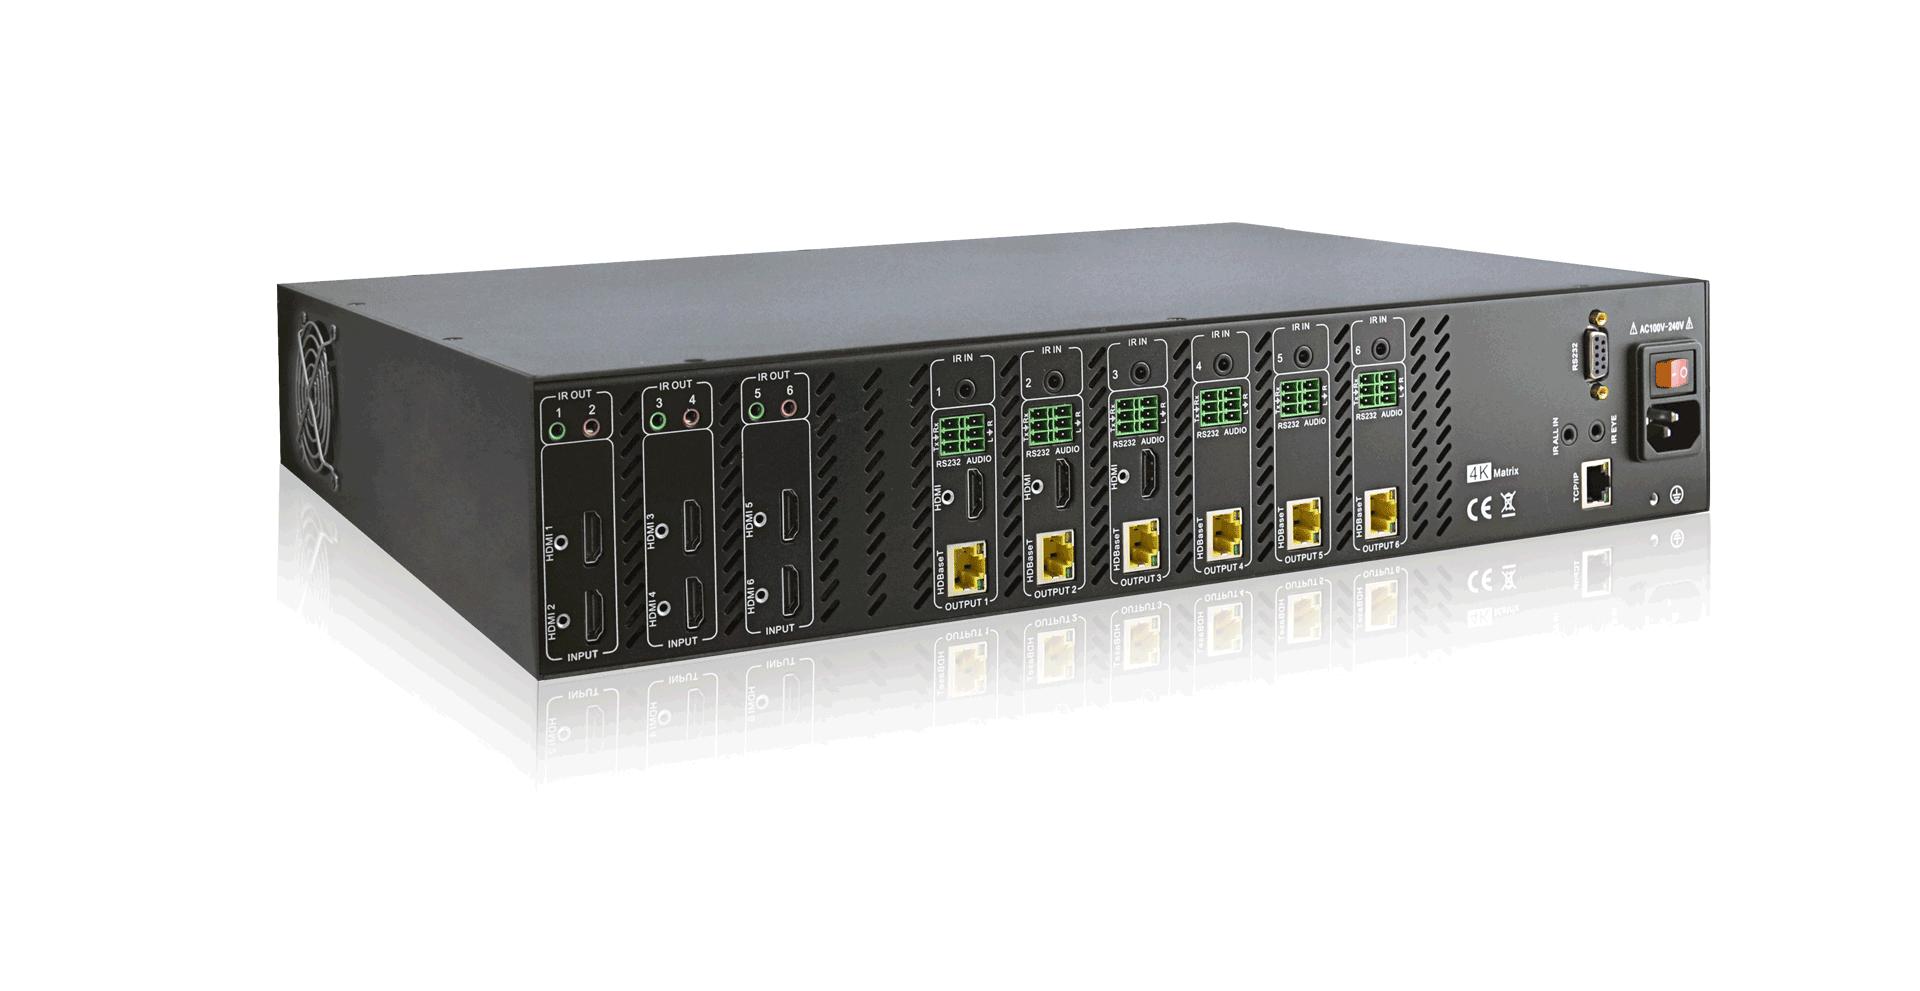 MAT.HDBT66-4K - Matrice 66 hybride HDMI HDBaseT sortie audio desembeddé et insert Rs232 4K 4:2:0 60Hz